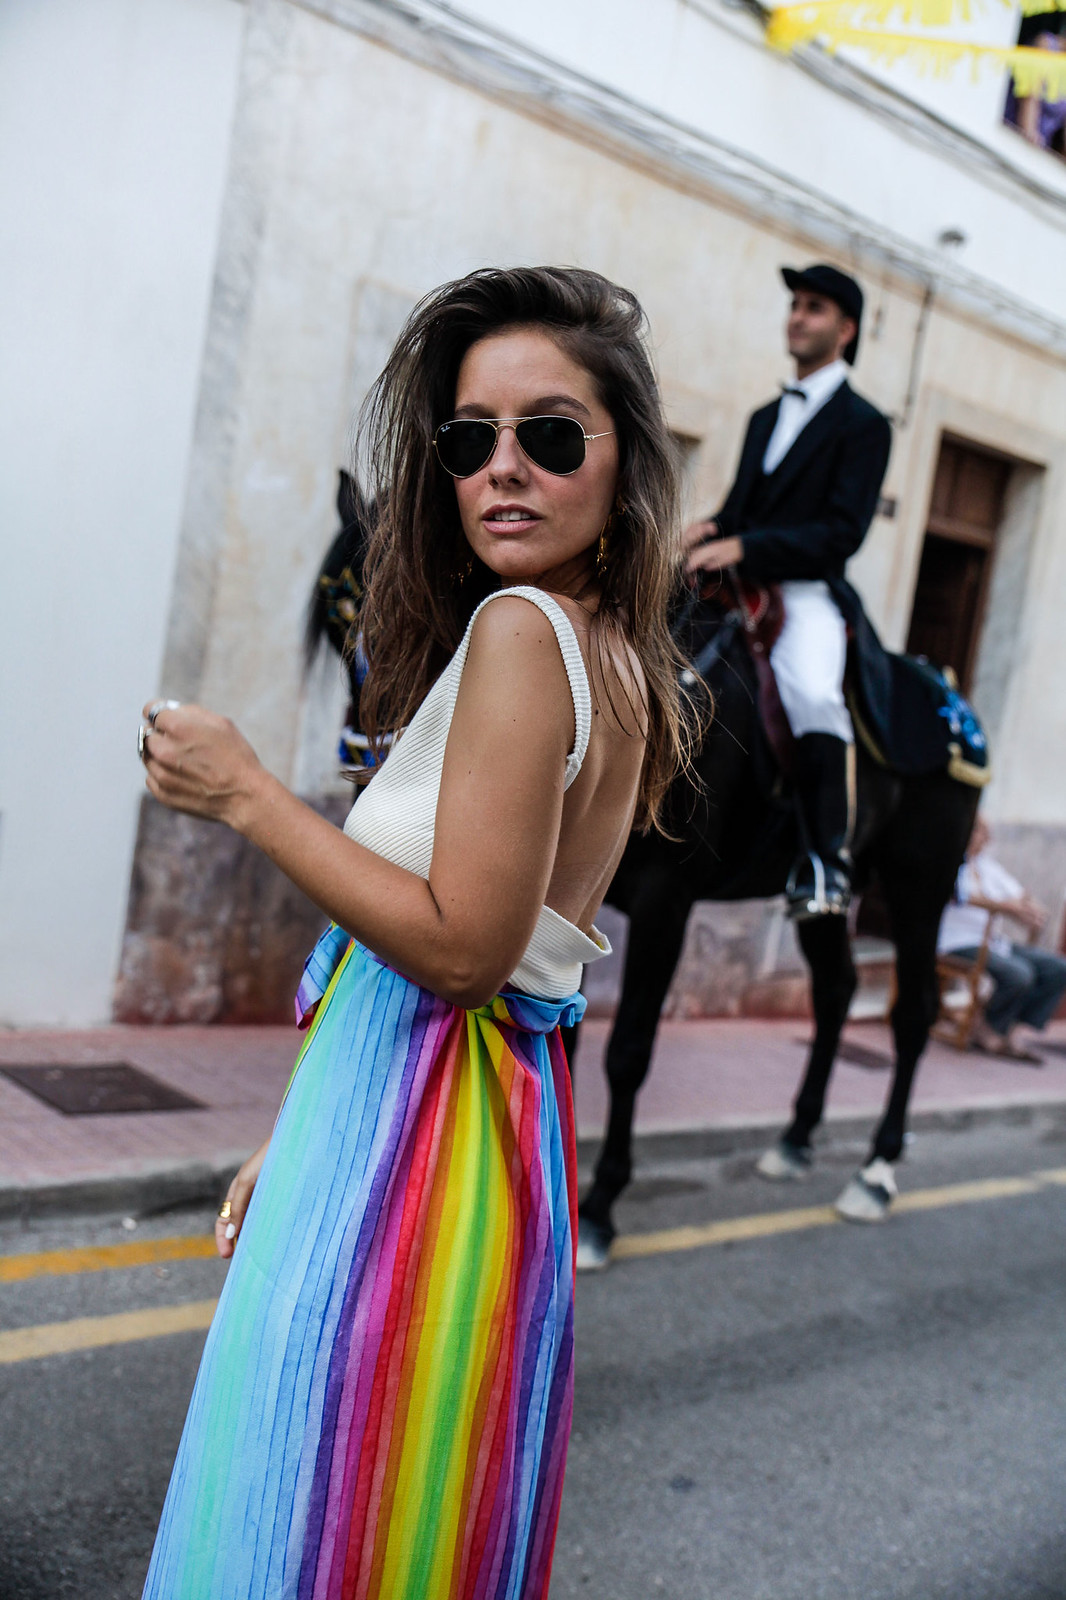 04_falda_arcoiris_top_crudo_look_fiestas_menorca_verano_theguestgirl_fashion_blogger_minorca_summer_laura_santolaria_rayban_sunglasses